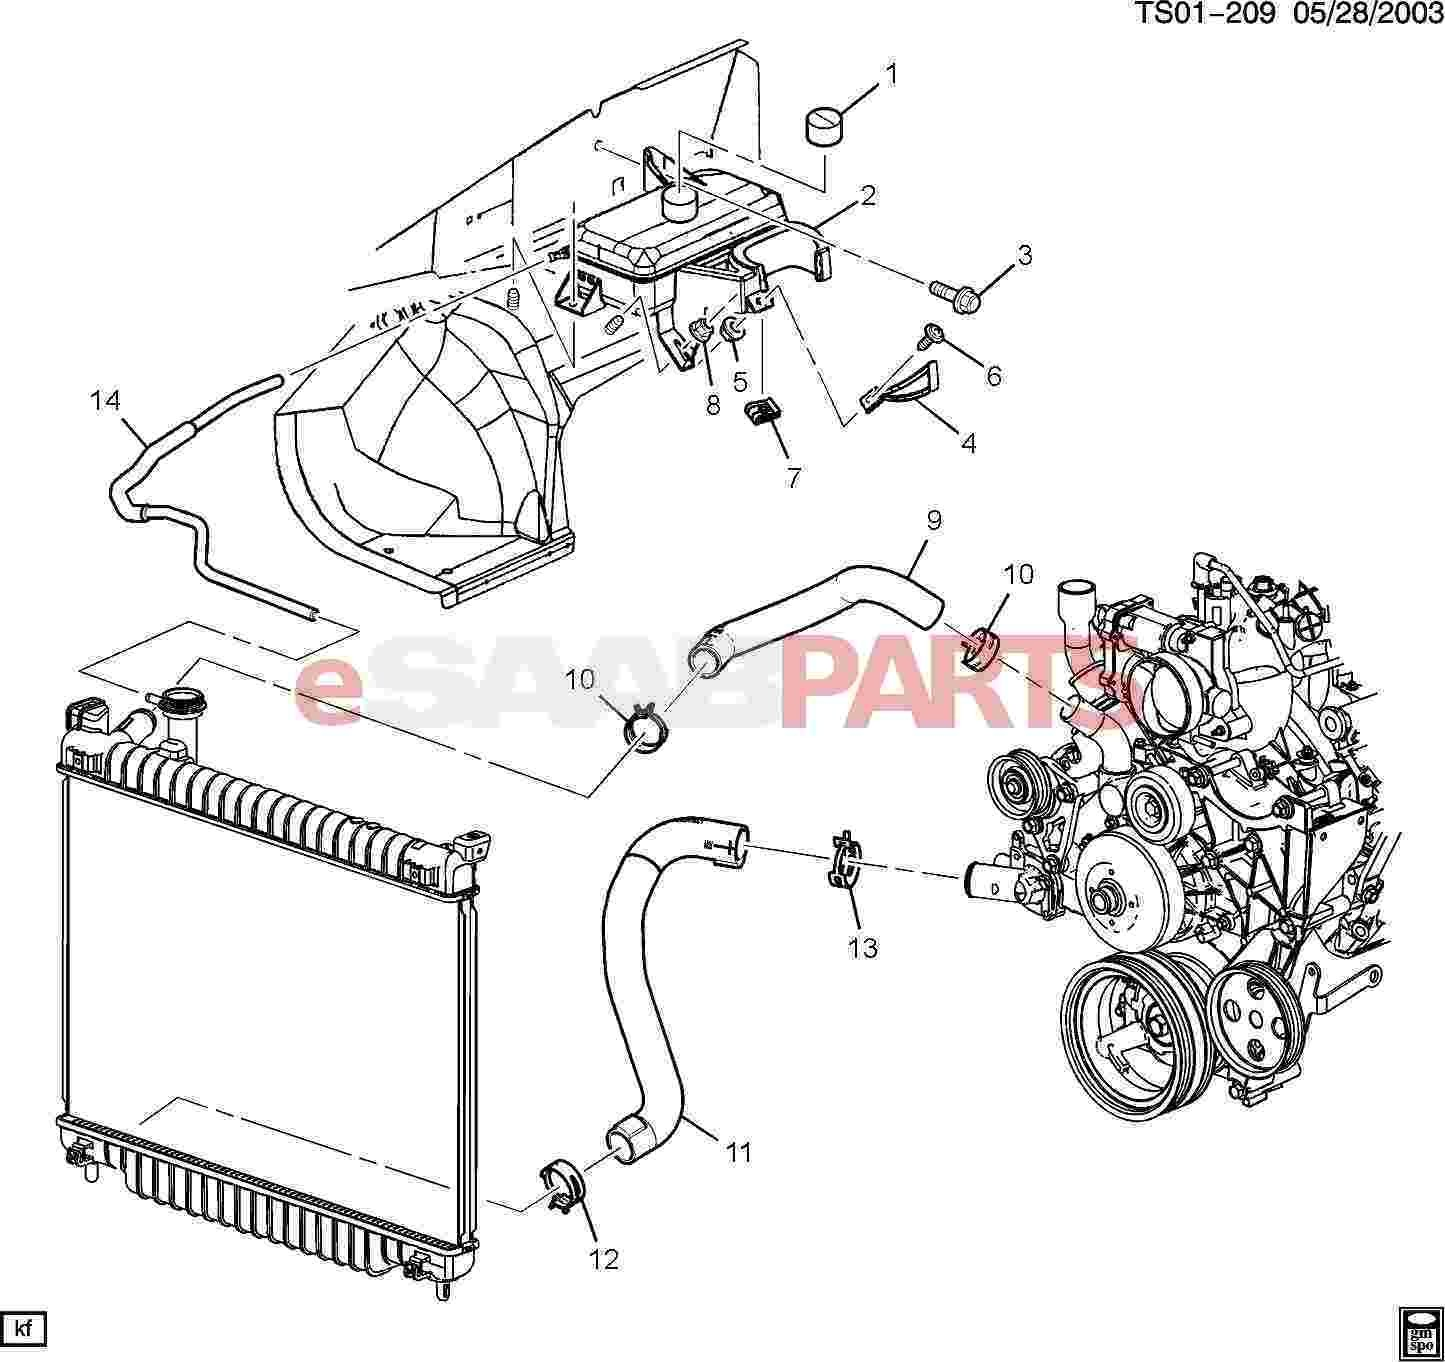 Fuse Box Diagram For Saab 9 7x 2003 5